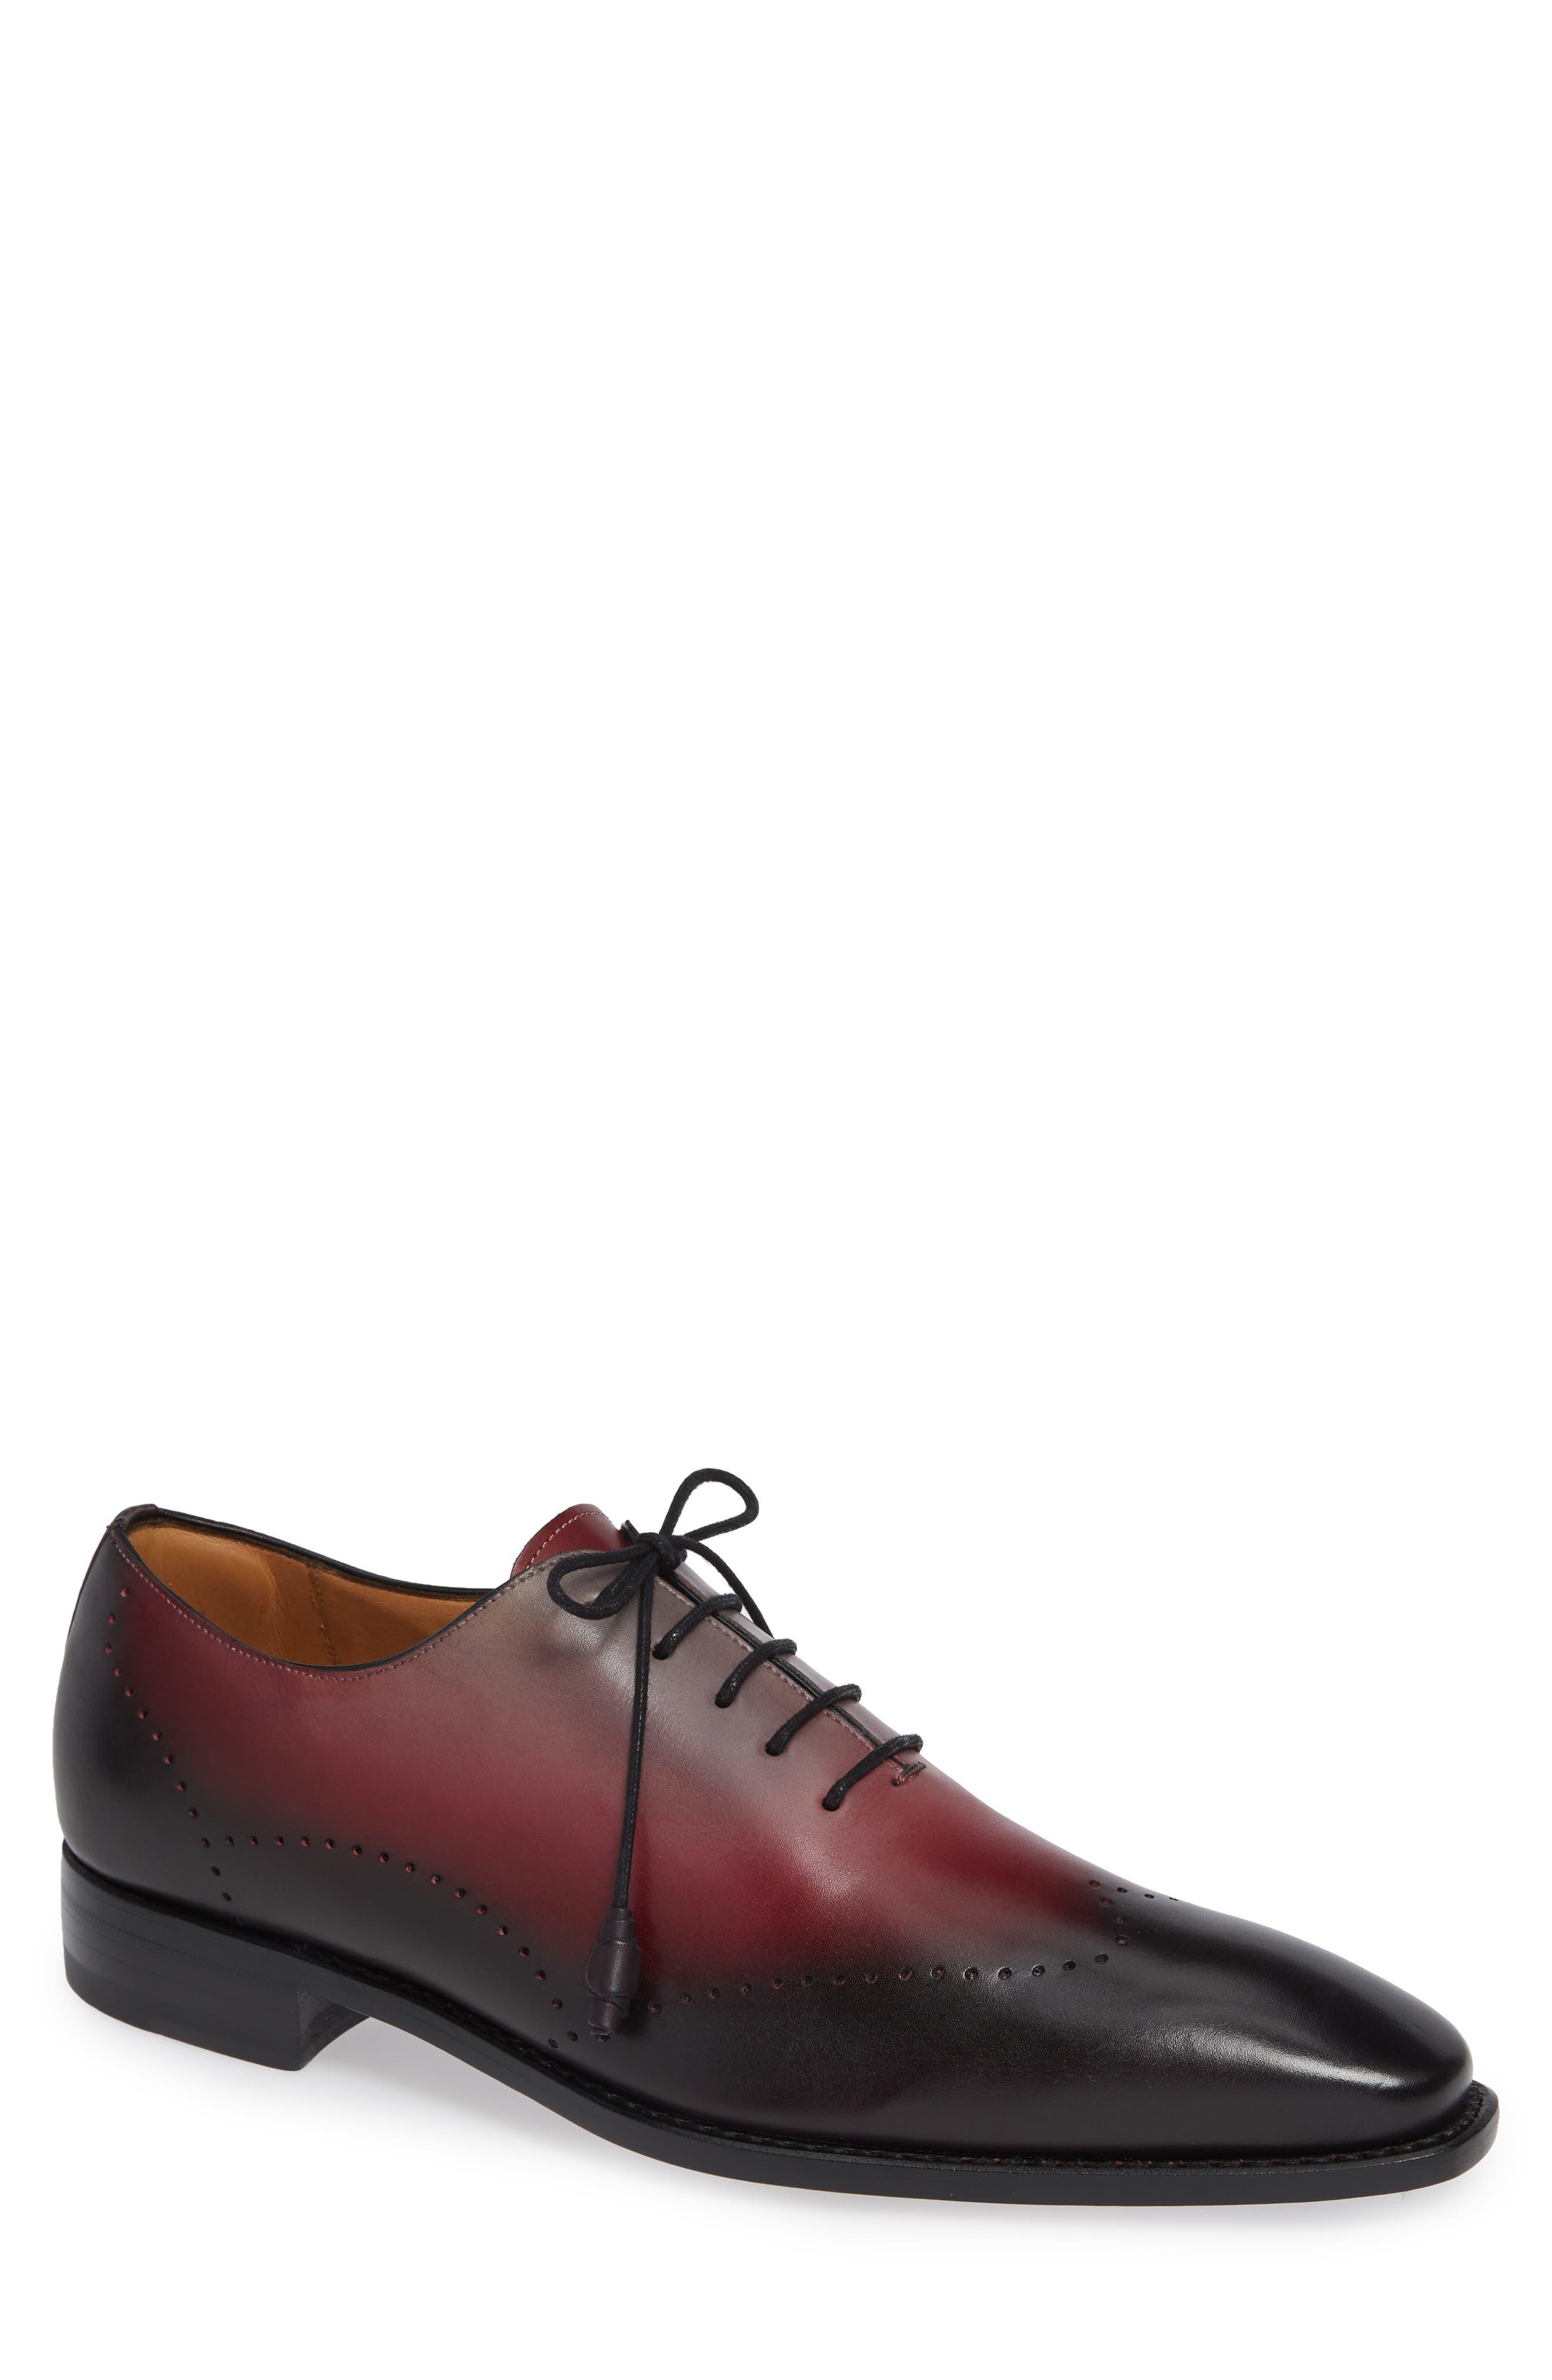 Addy Wingtip Whole Cut Shoe,                         Main,                         color, BLACK LEATHER